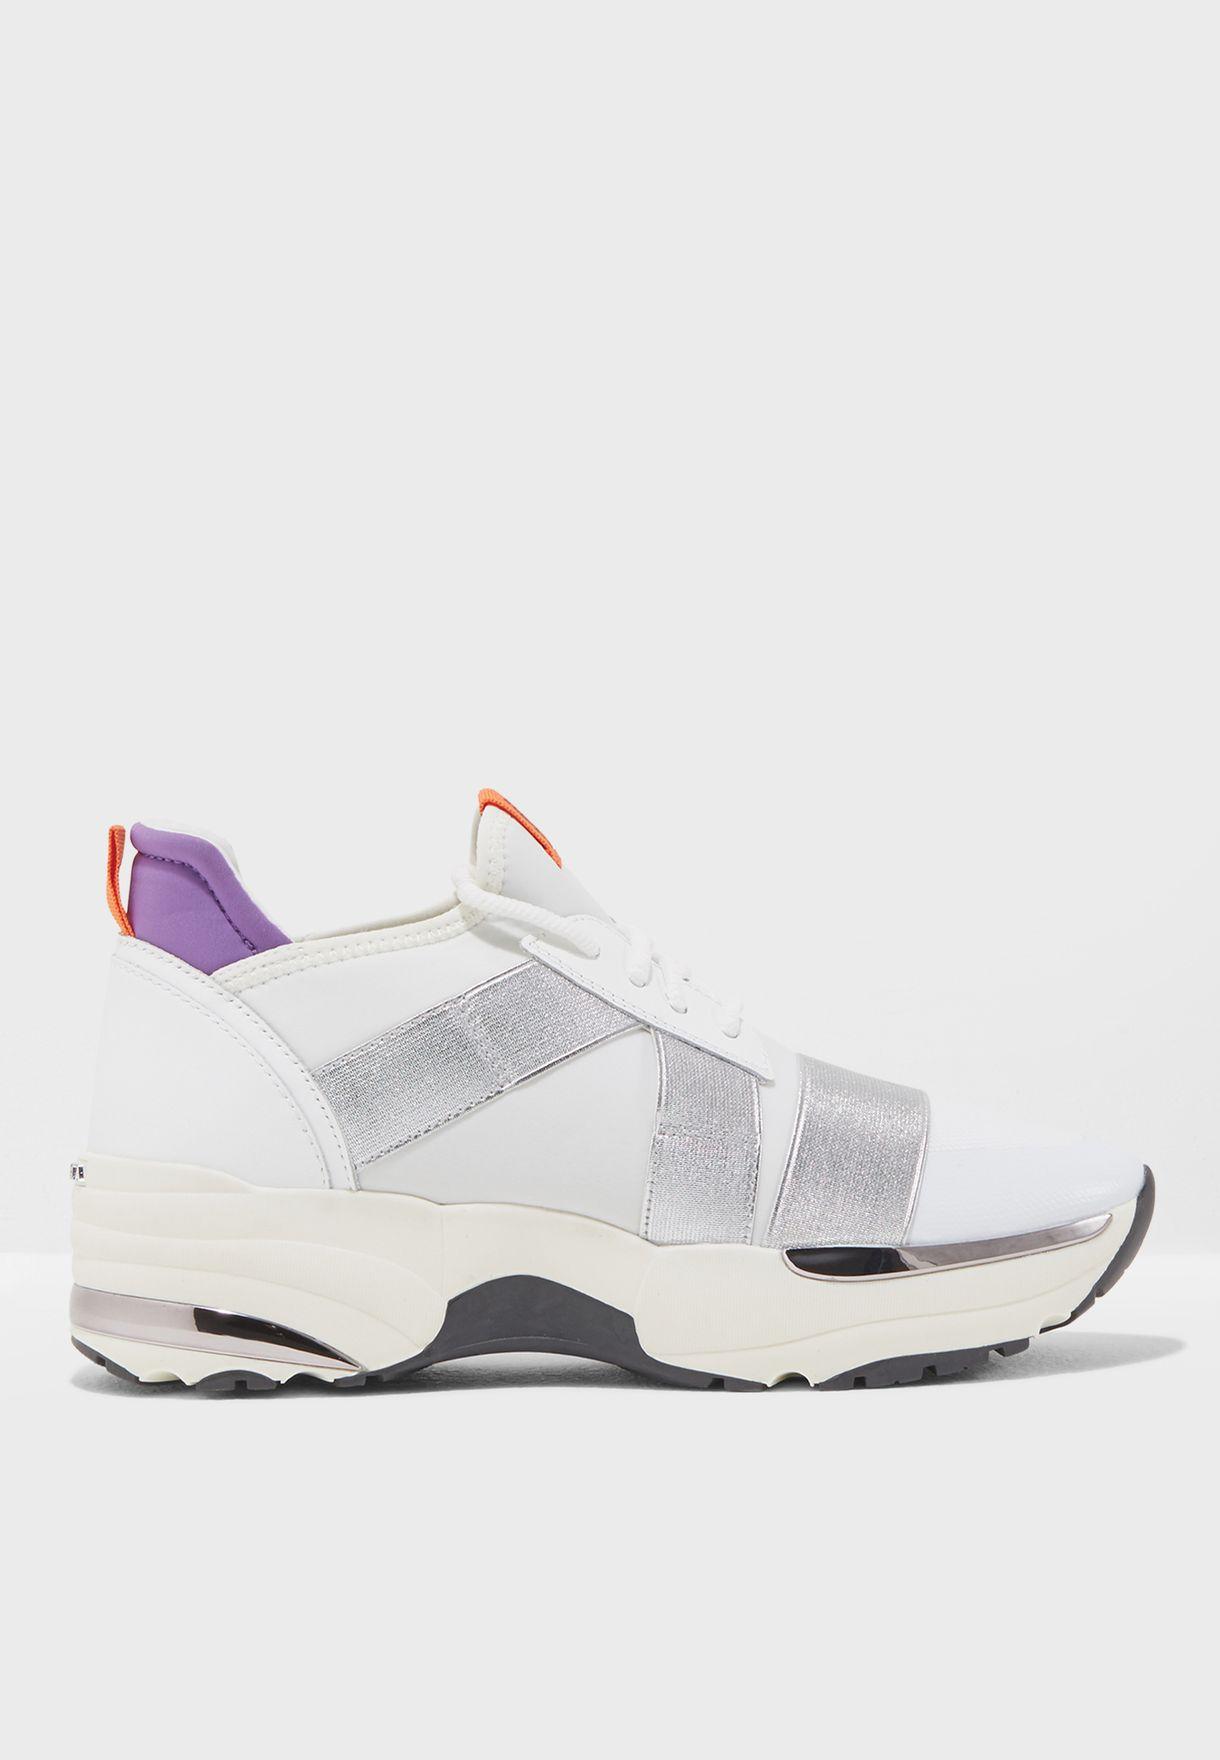 4e29ad2ad49 Shop Carvela white Lauryn Sneaker LAURYN NP for Women in UAE ...